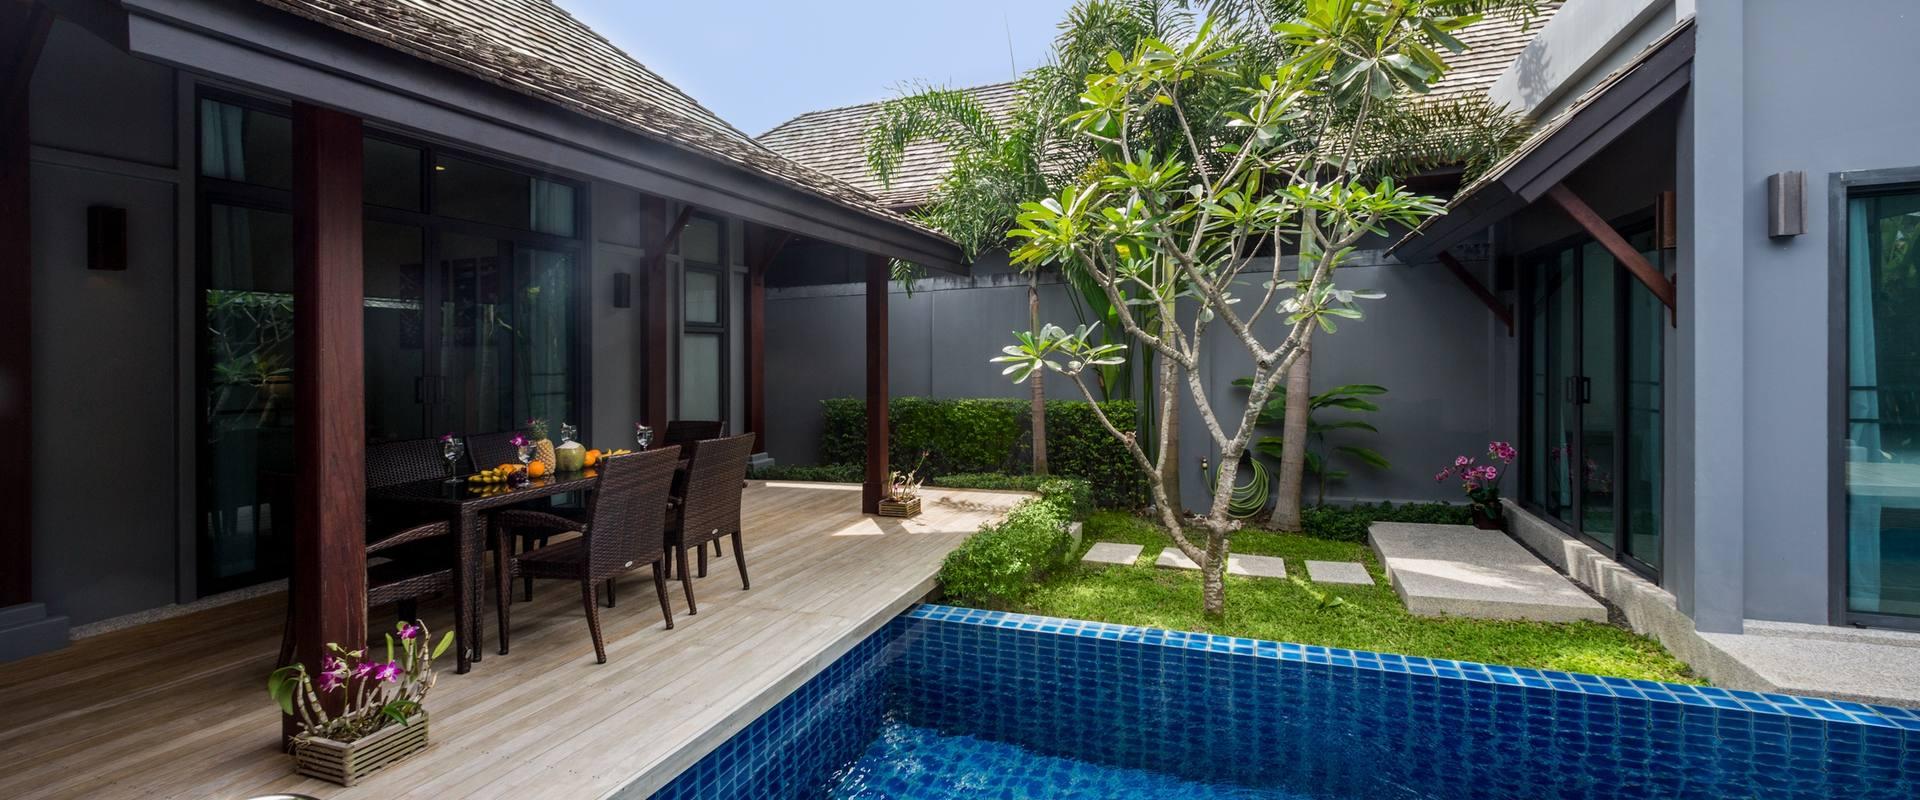 Vacation Rental Villa Hihiria